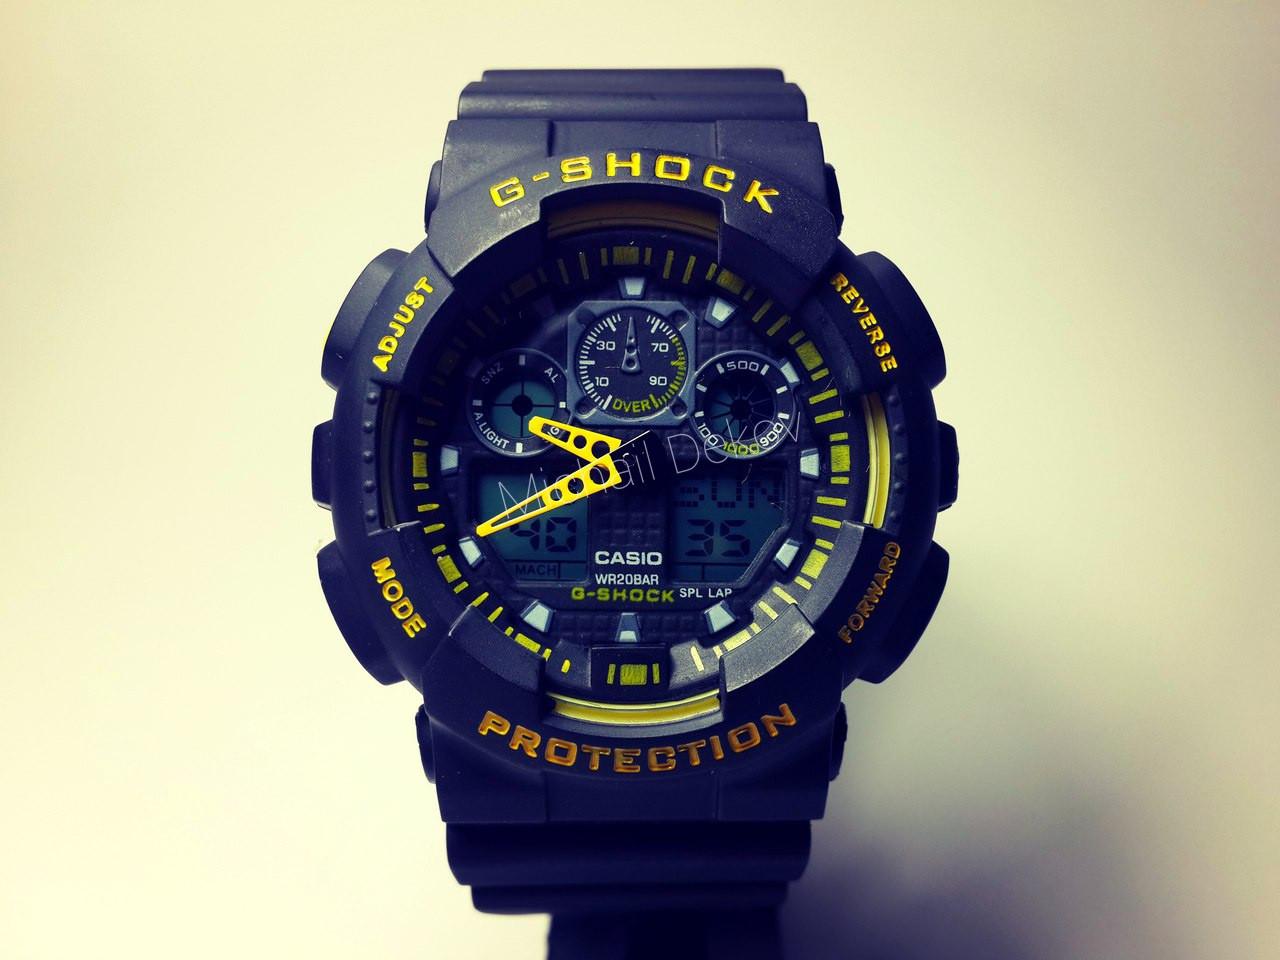 ЧАСЫ CASIO G-SHOCK GA-100   Black–Yellow -реплика